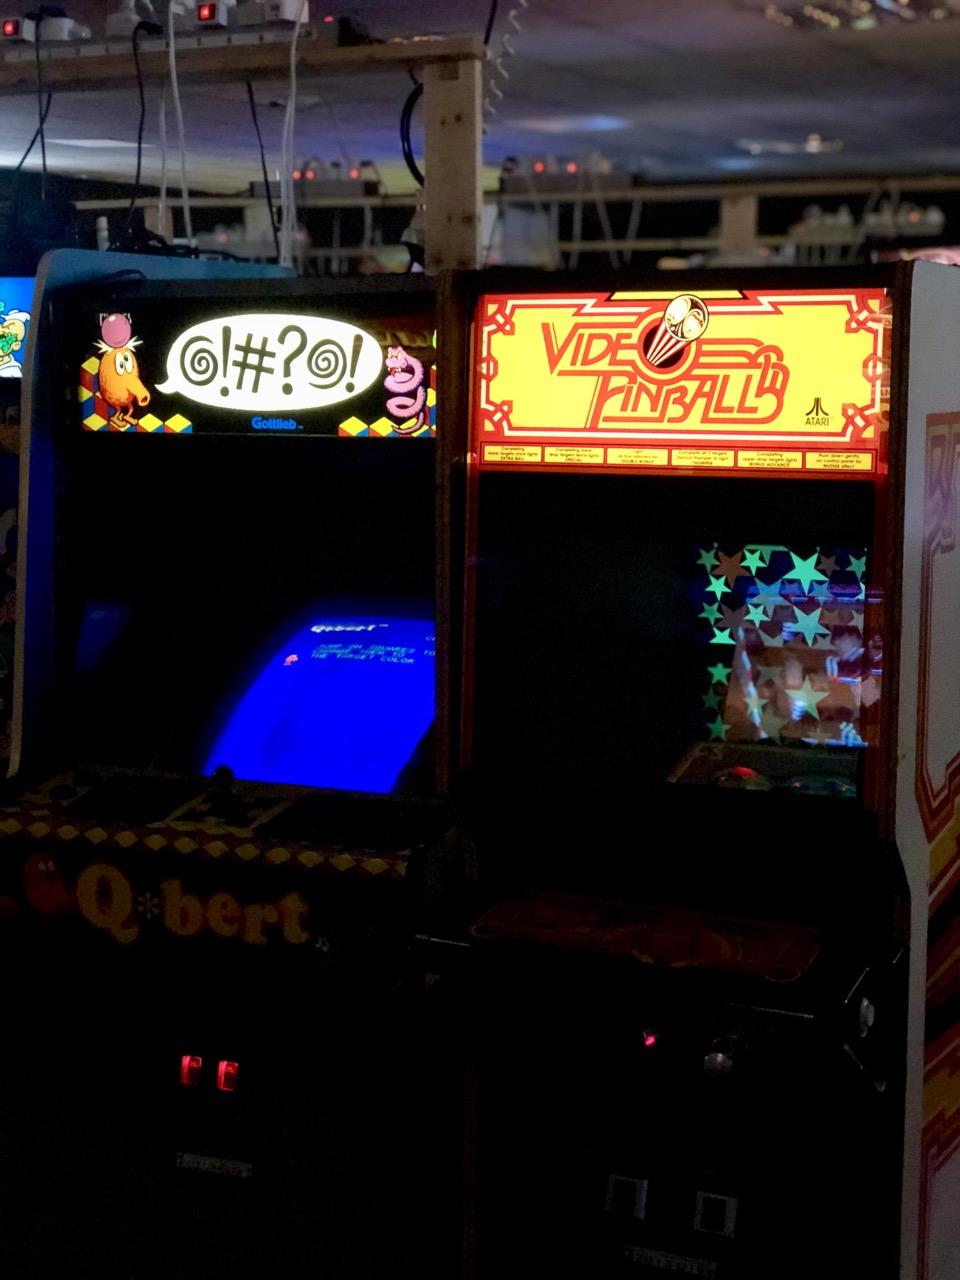 Q*Bert und Video Pinball Seite an Seite im FAMS. (Bild: André Eymann)